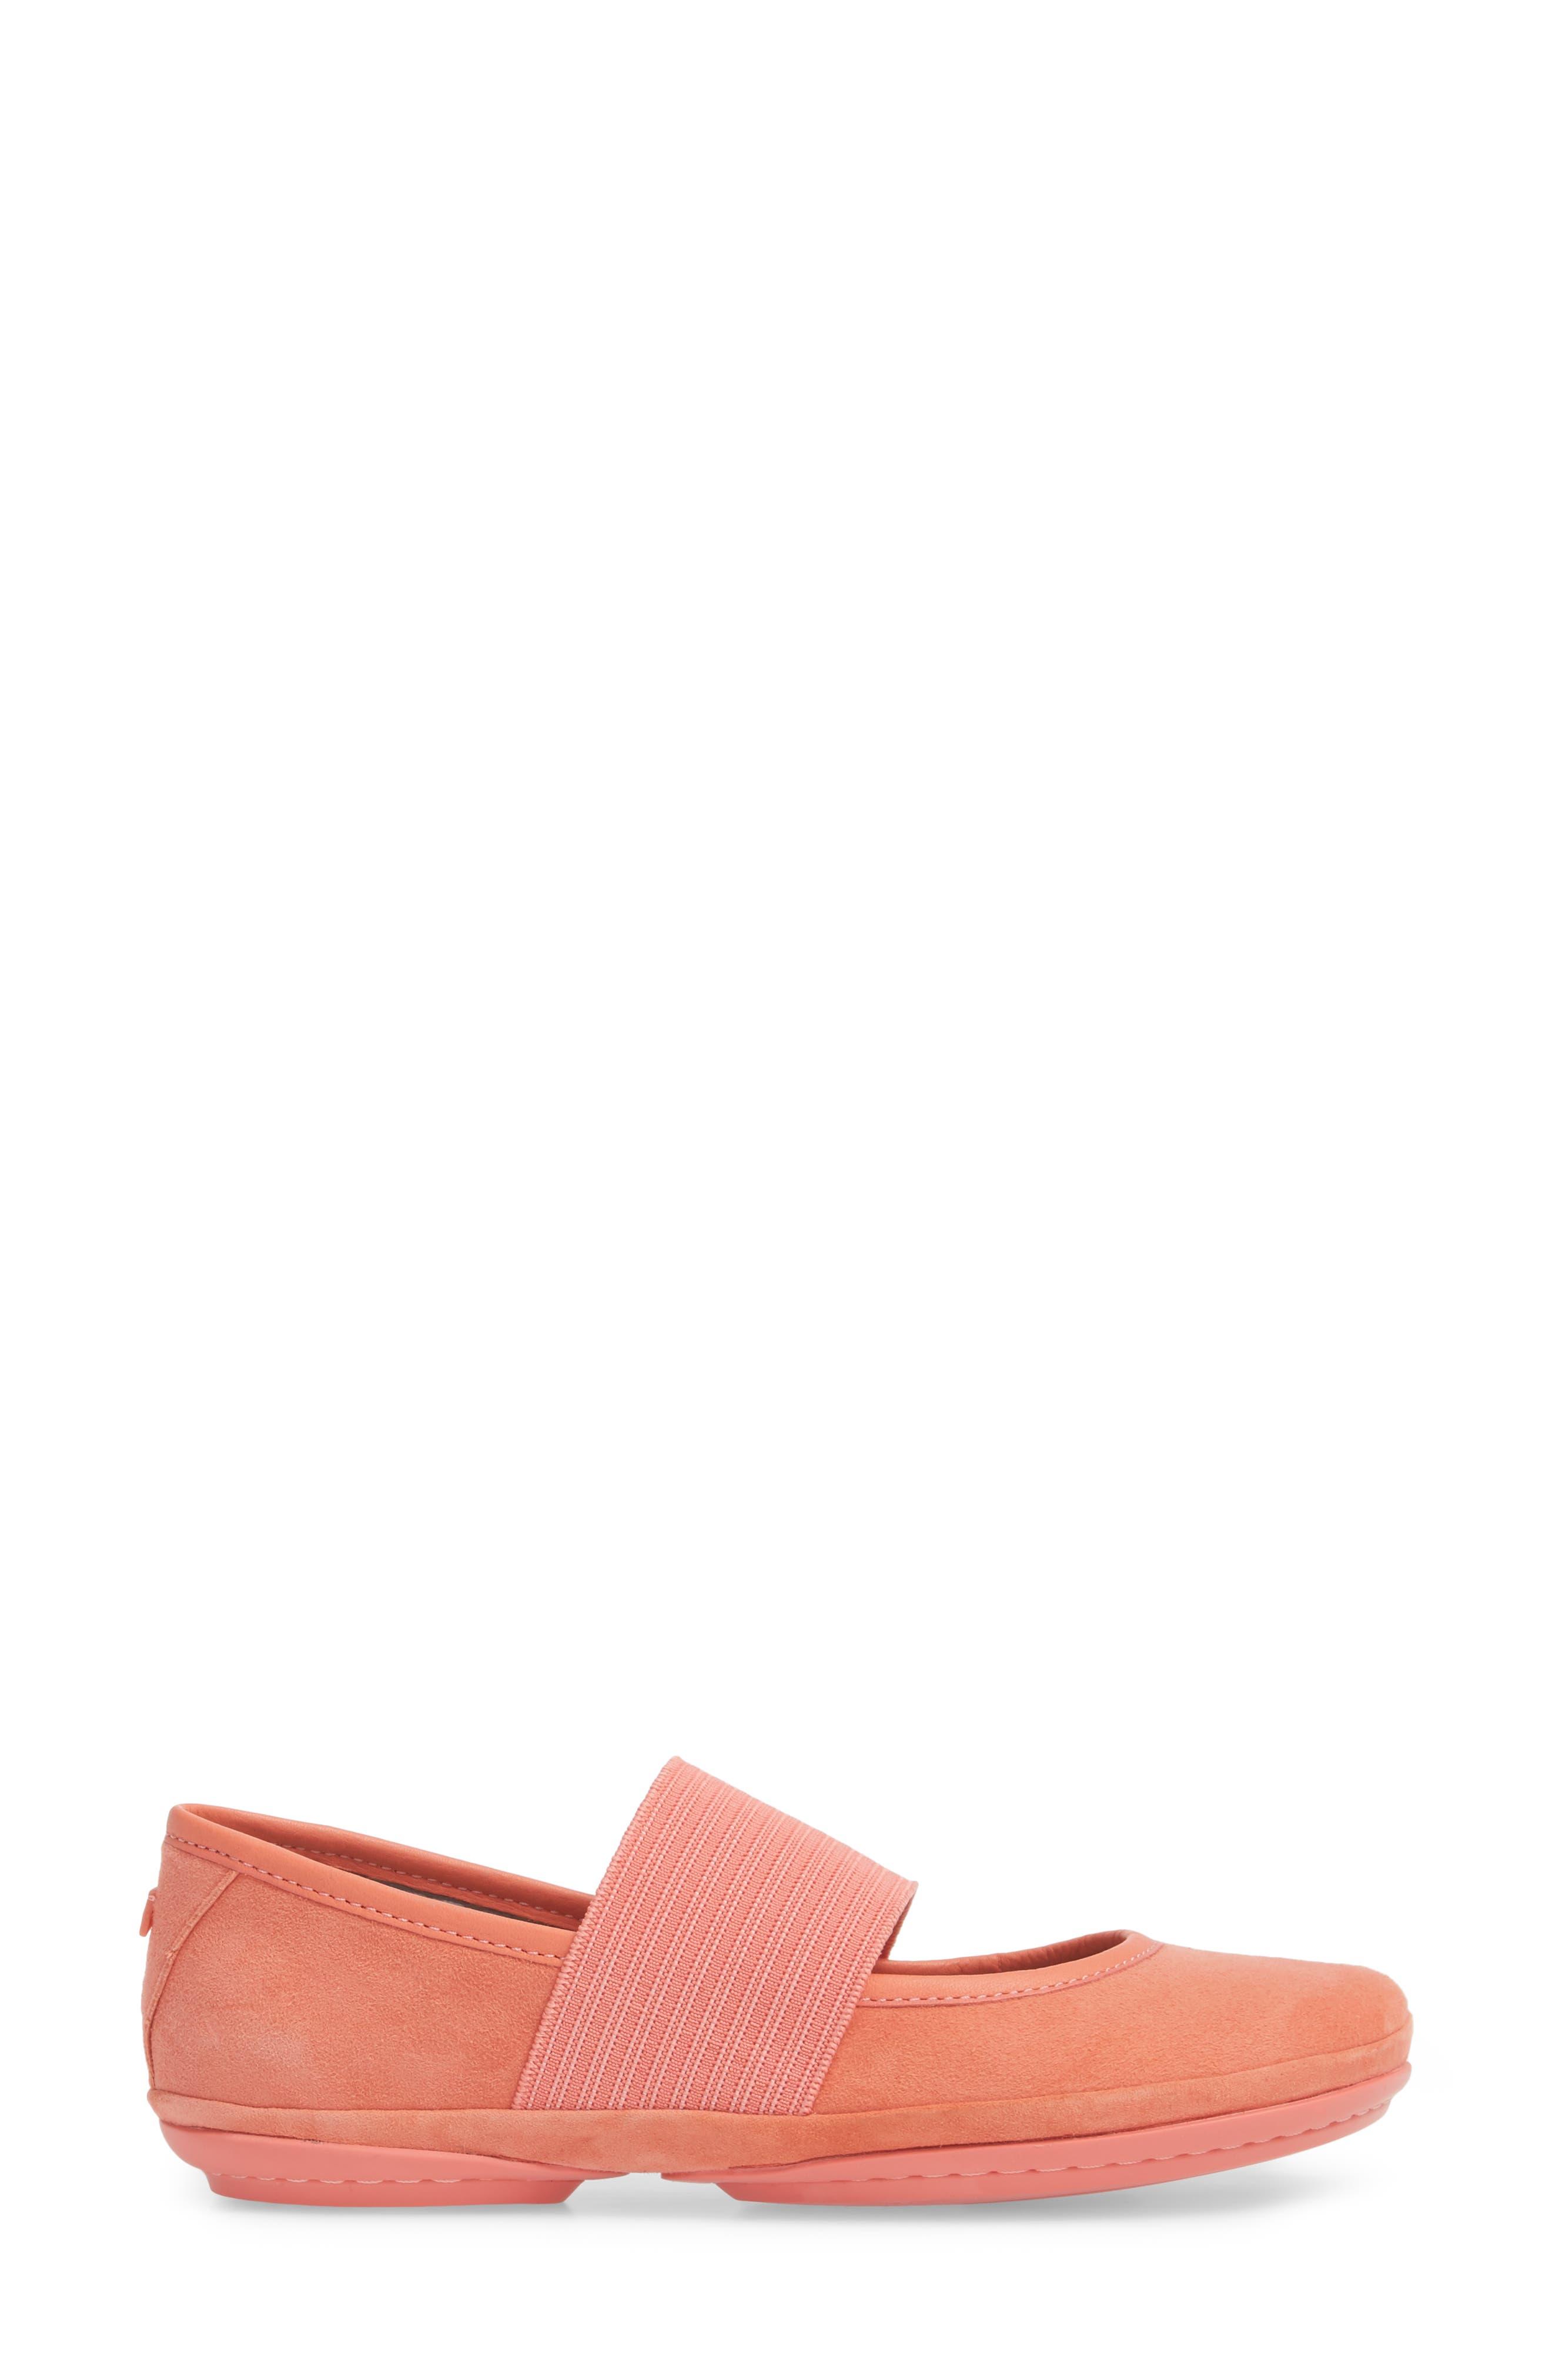 'Right Nina' Leather Ballerina Flat,                             Alternate thumbnail 55, color,